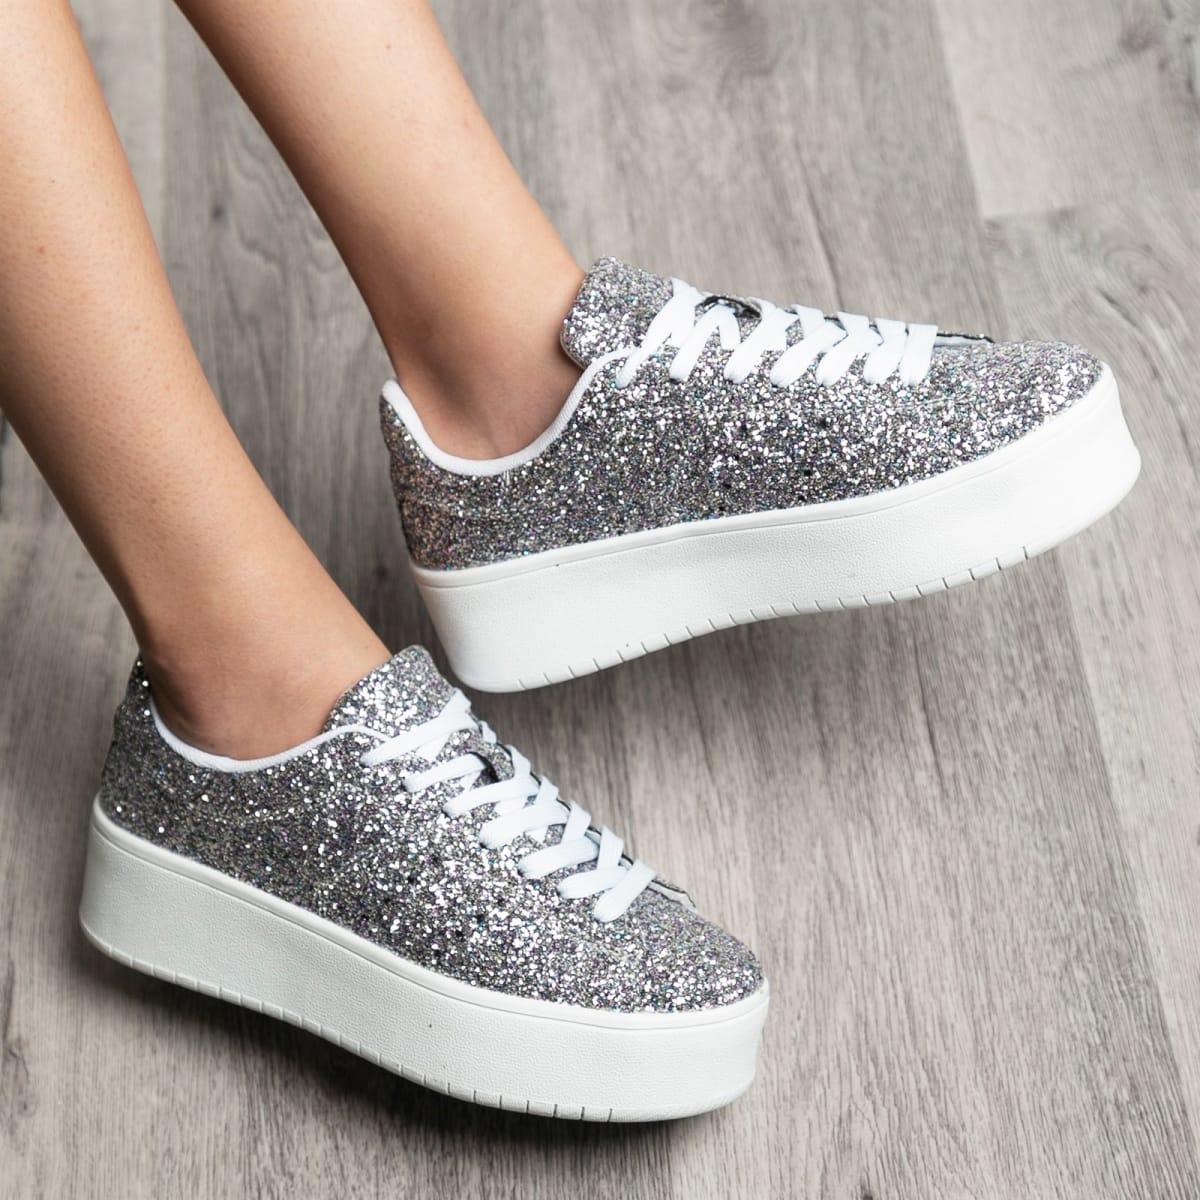 c06b76061e Hero Sneakers by J. Adams | Jane